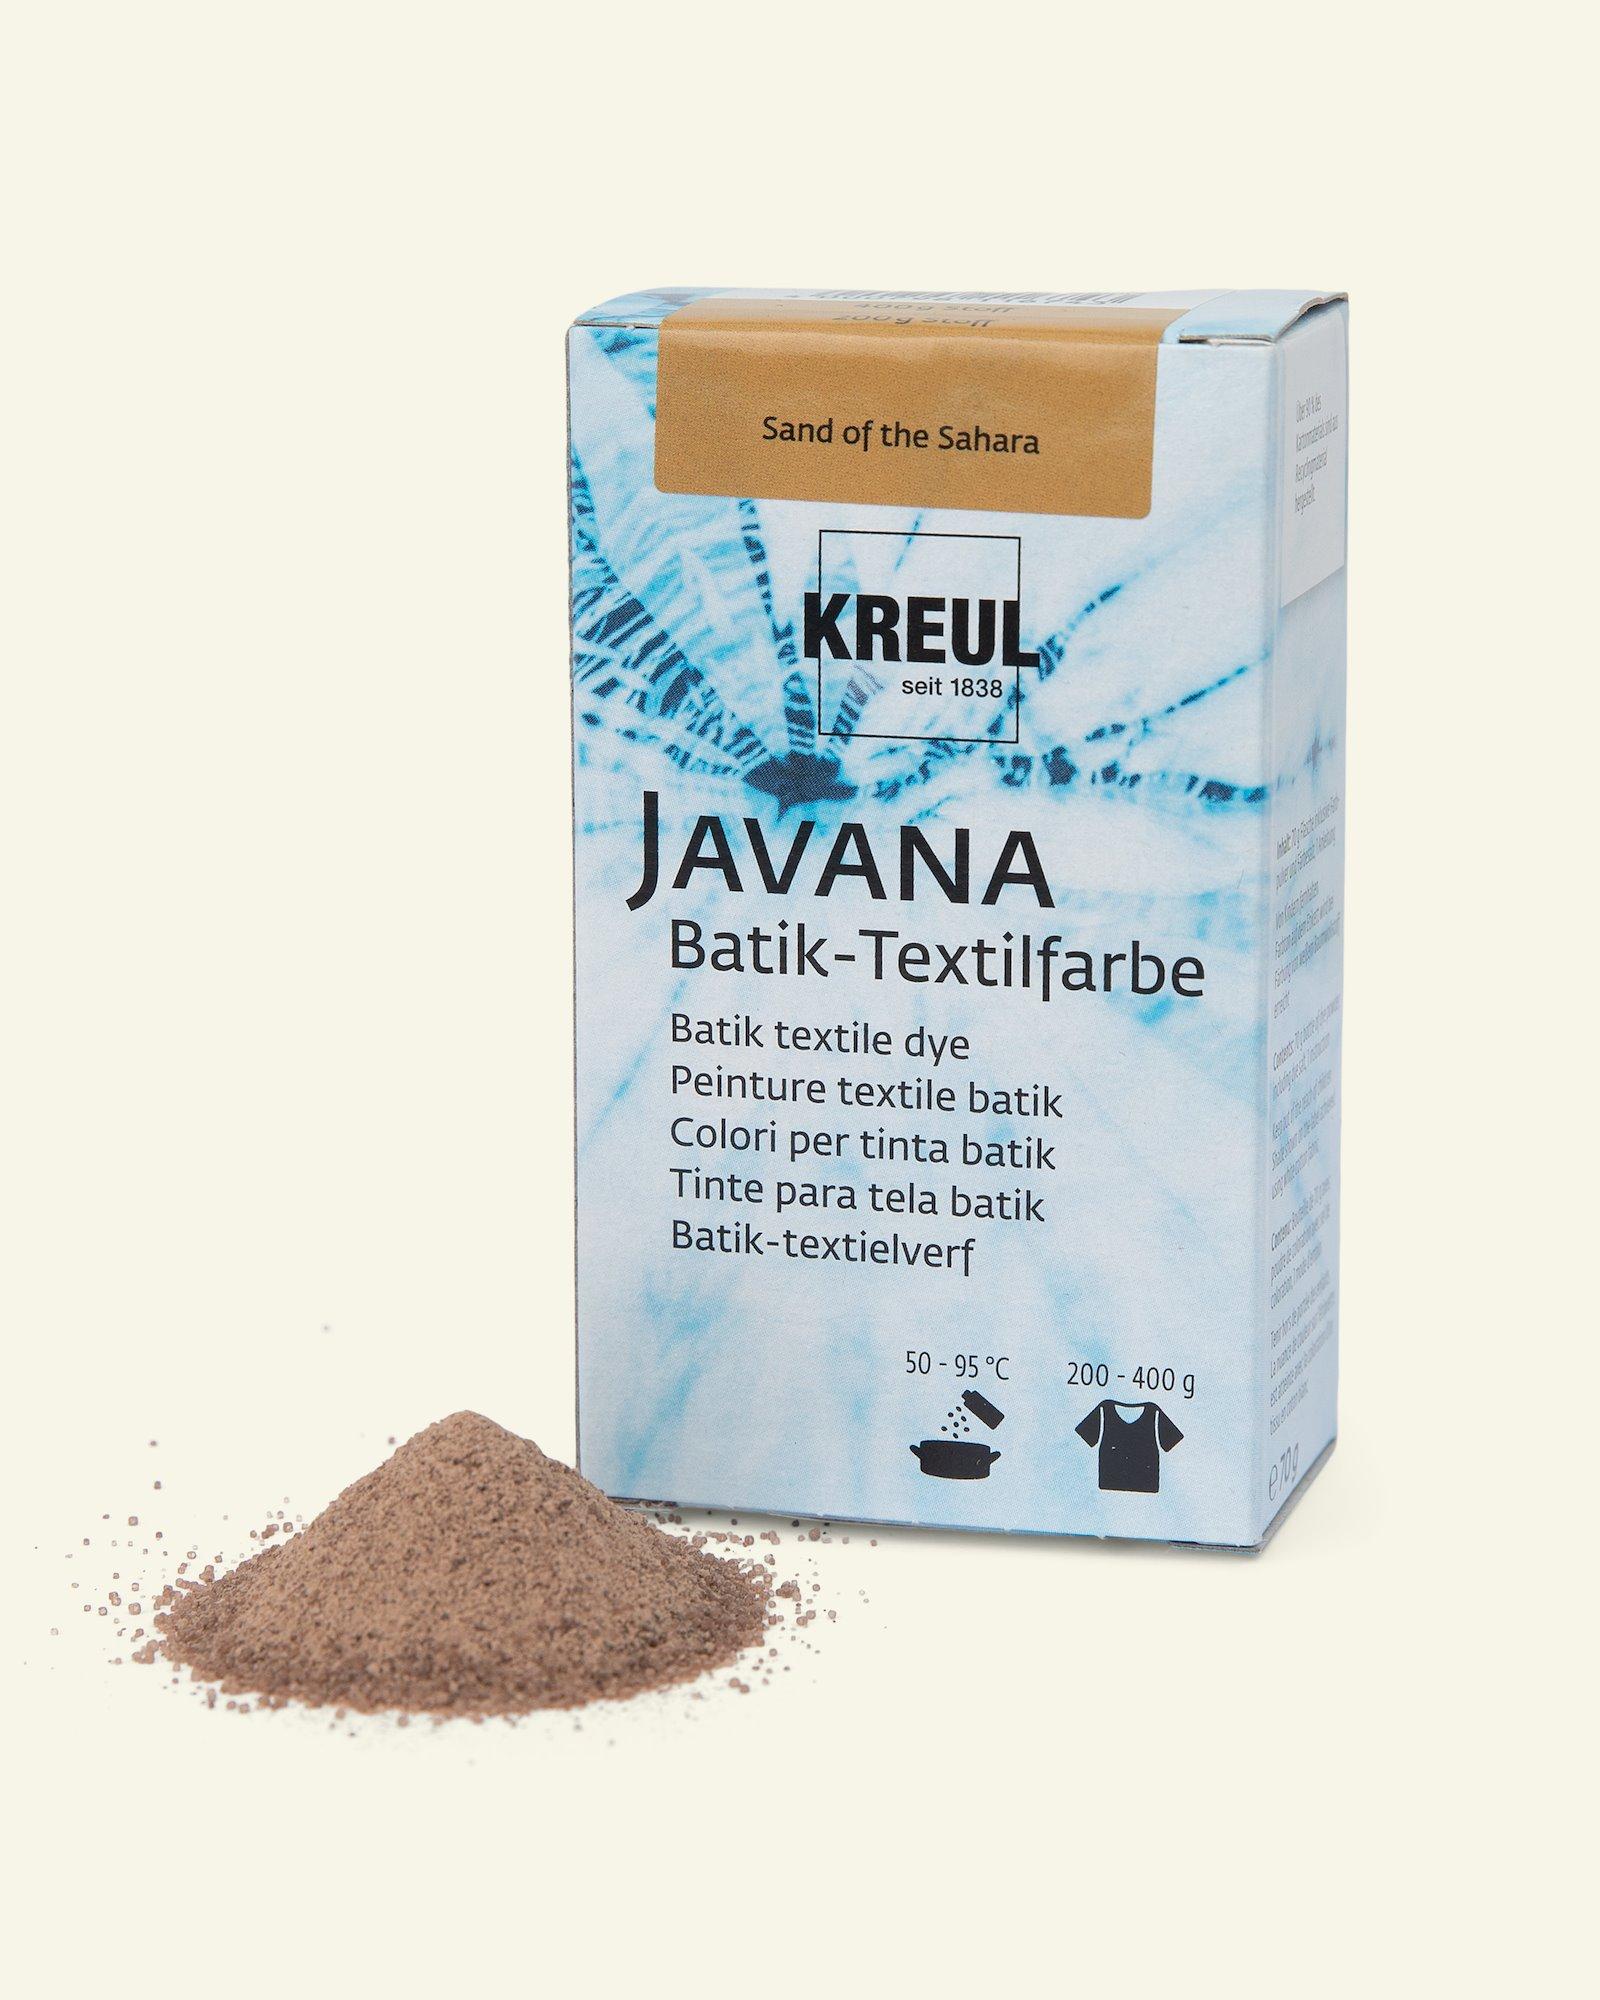 Javana batik dye sand 70g